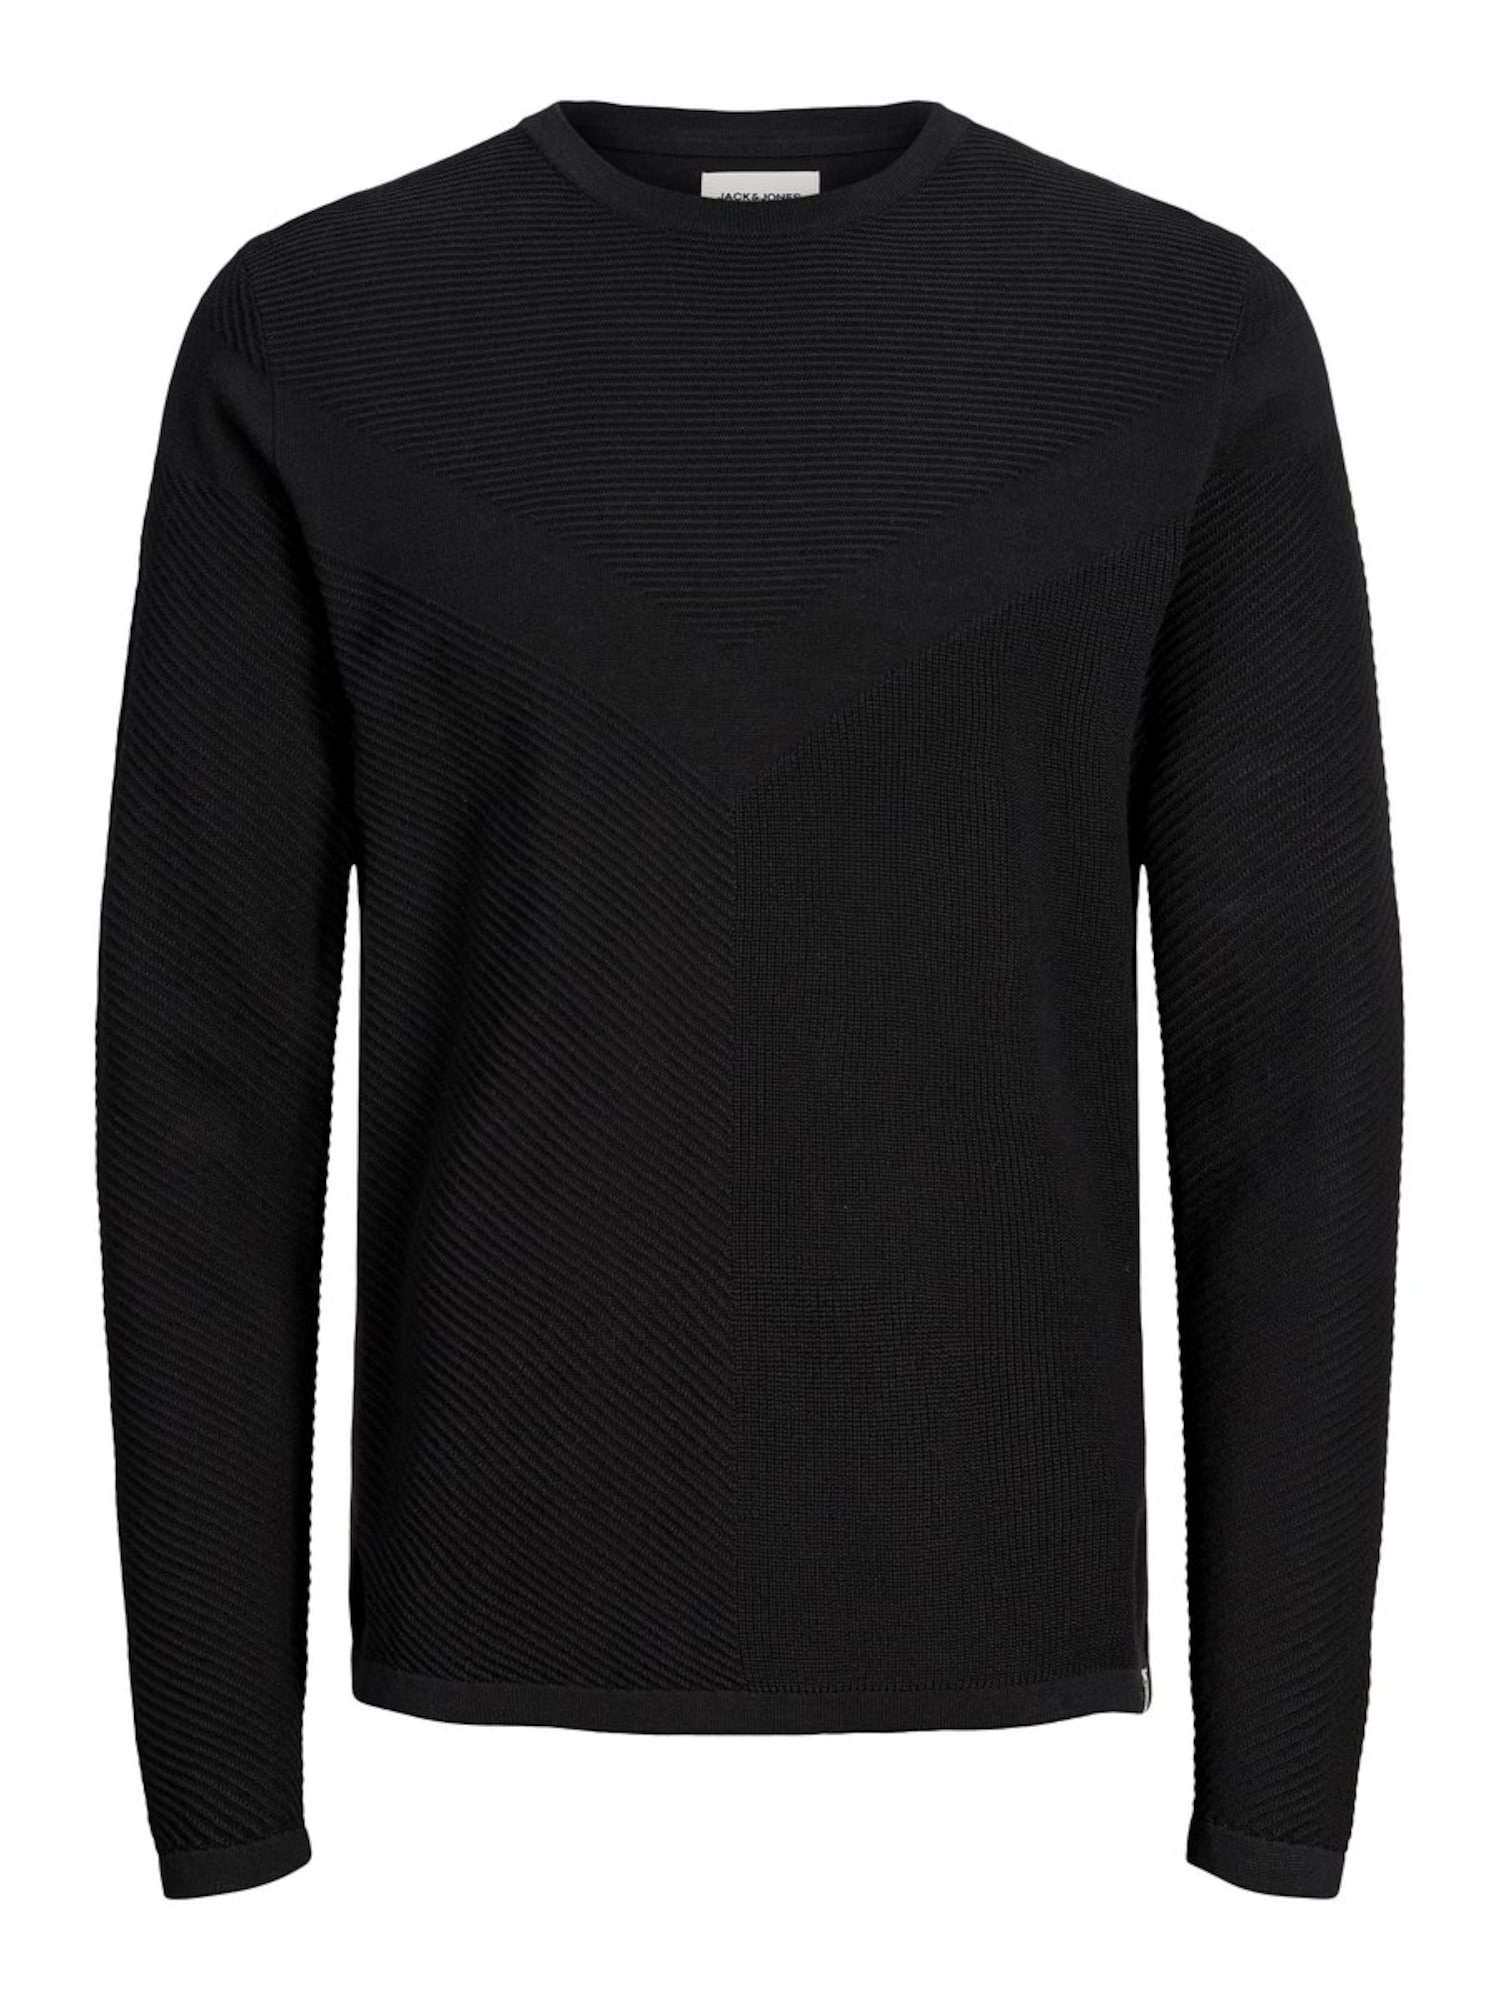 Pullover | Bekleidung > Pullover > Sonstige Pullover | jack & jones